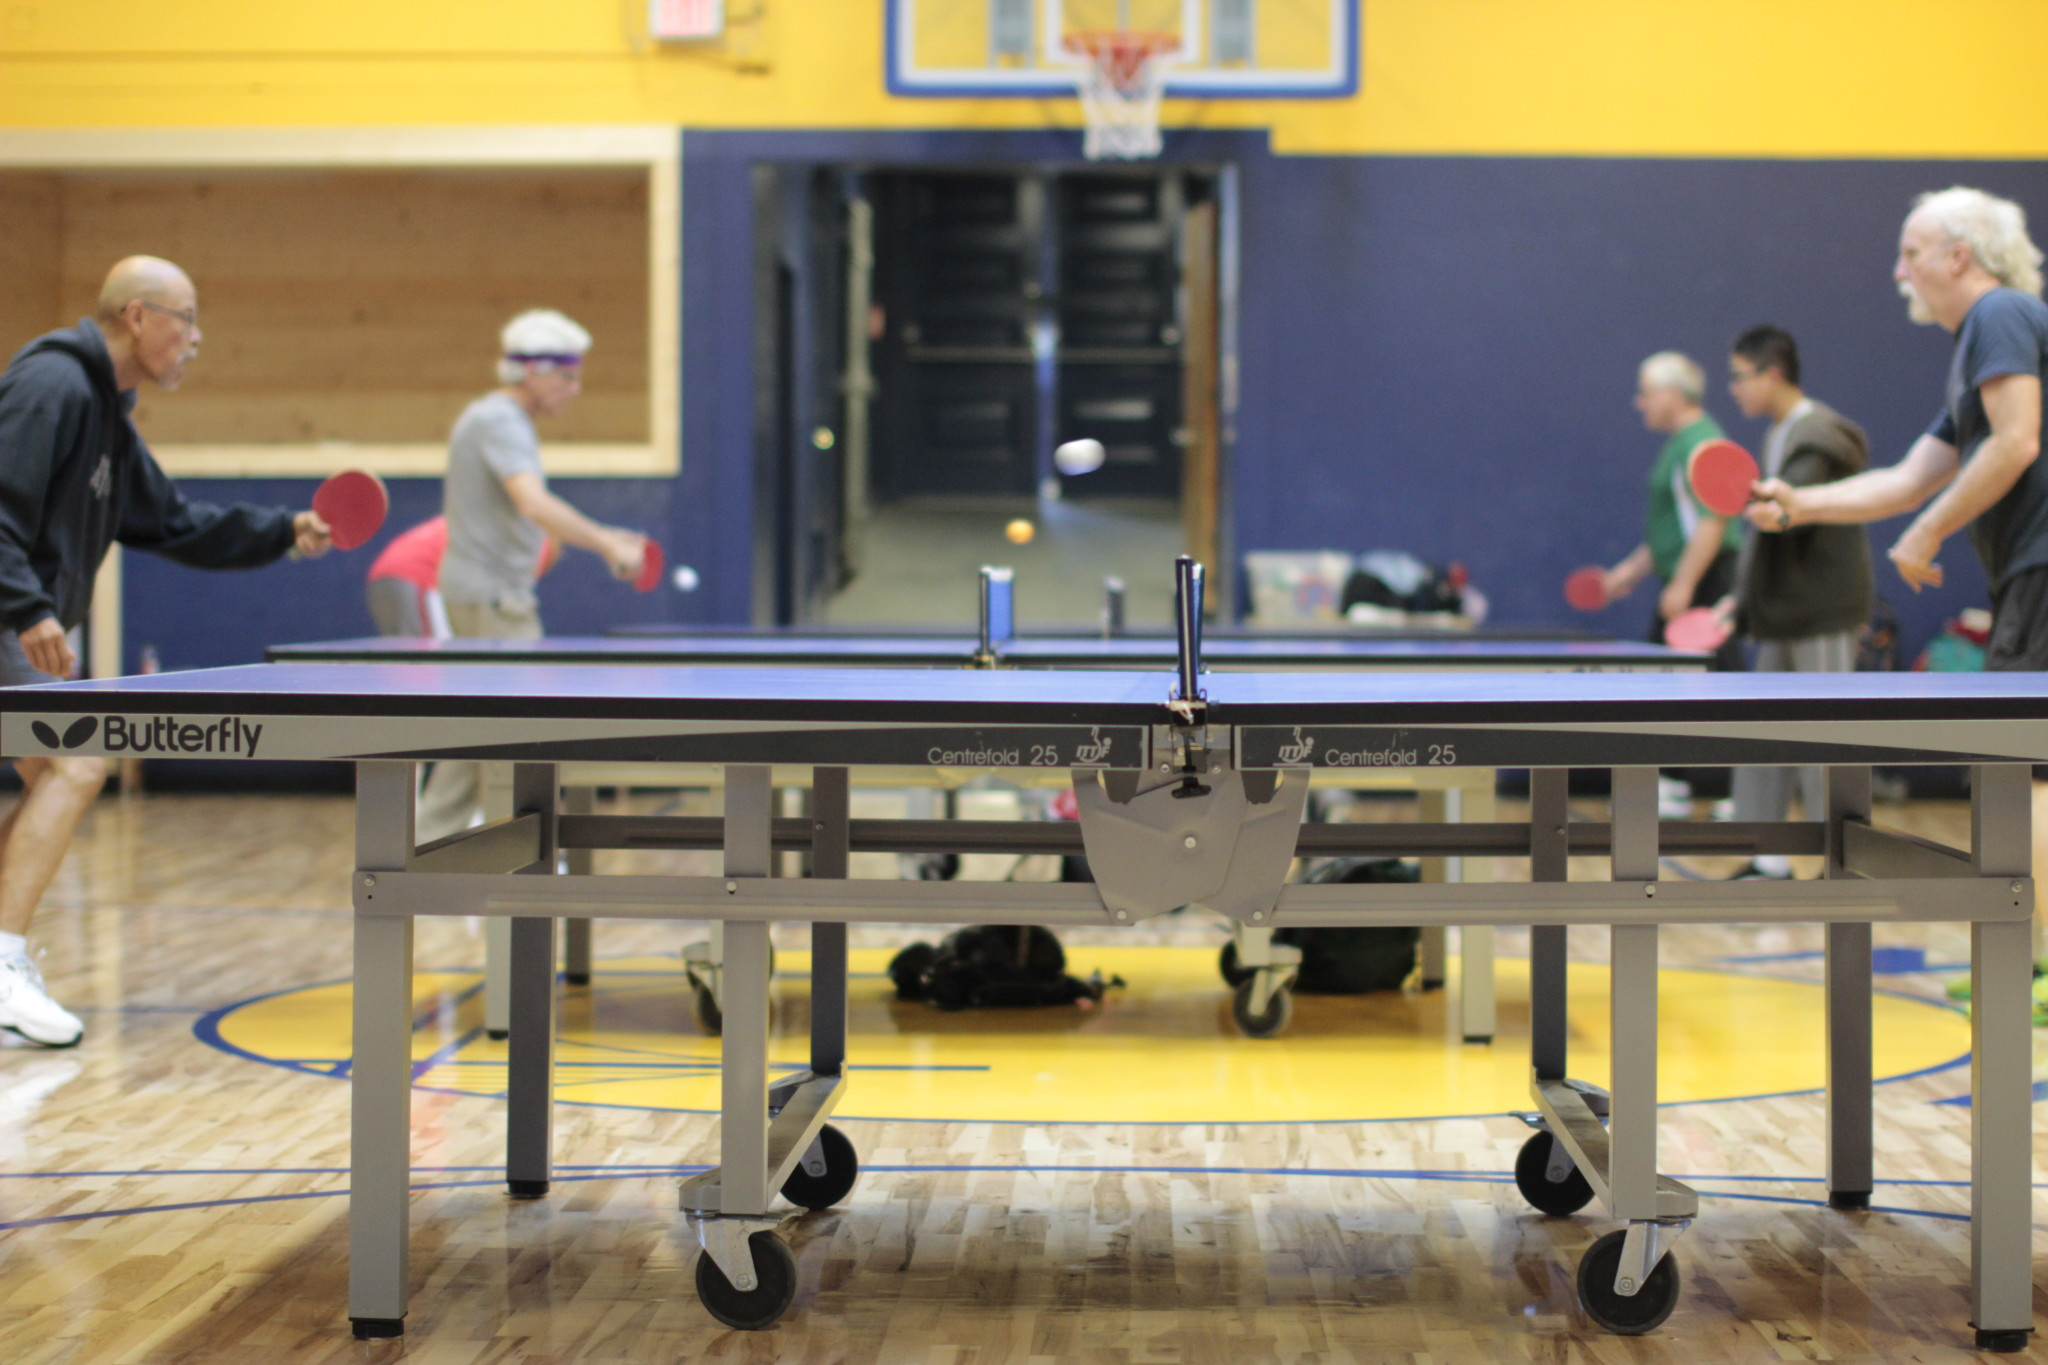 The Potrero Hill Recreation Center has a gymnasium, basketball and tennis courts, a baseball diamond and a playground.